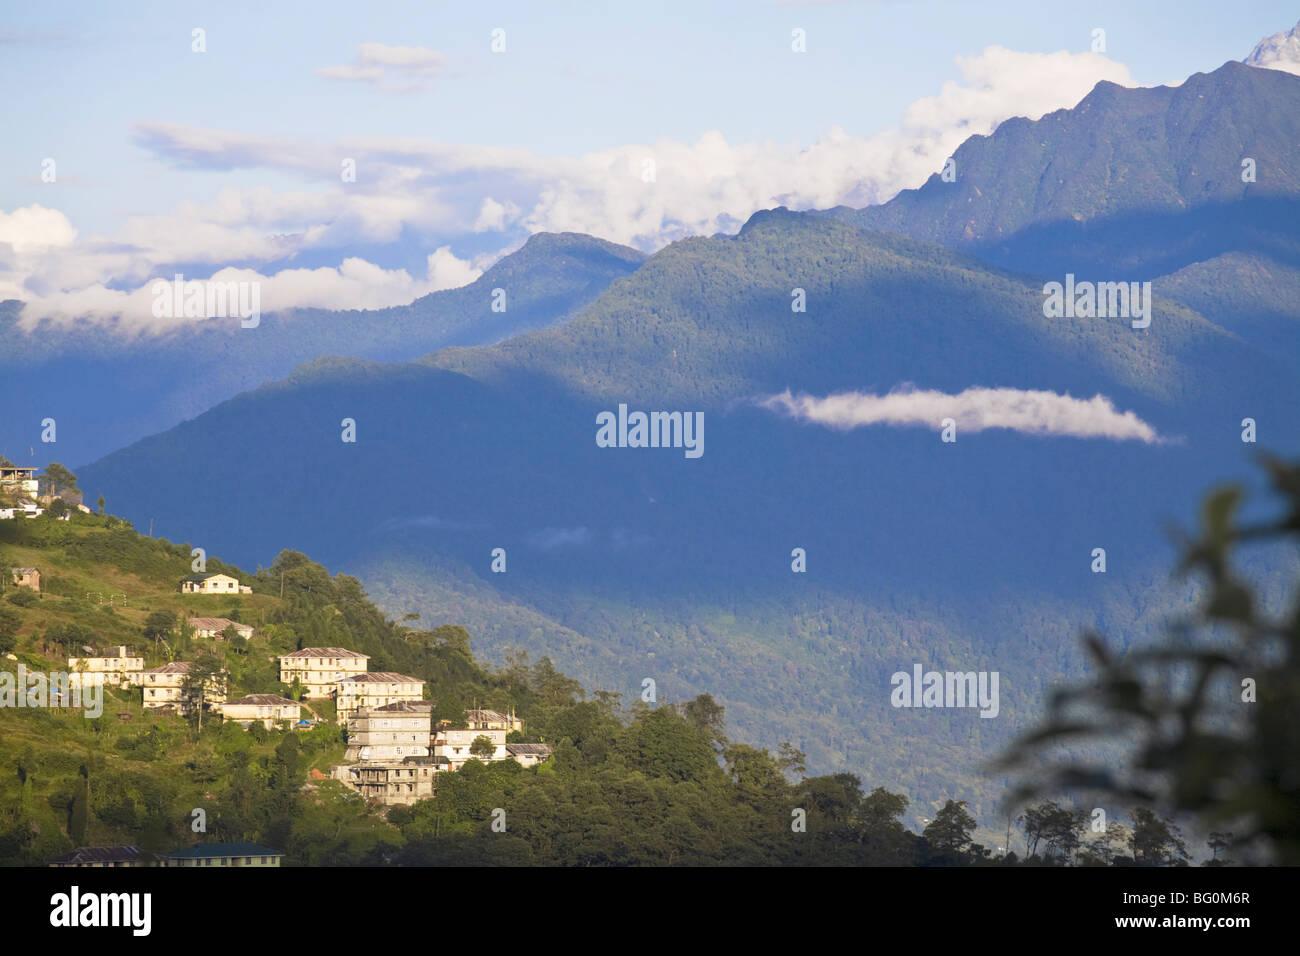 Vista dal punto di vista Tashi, Gangtok, Sikkim, India, Asia Immagini Stock